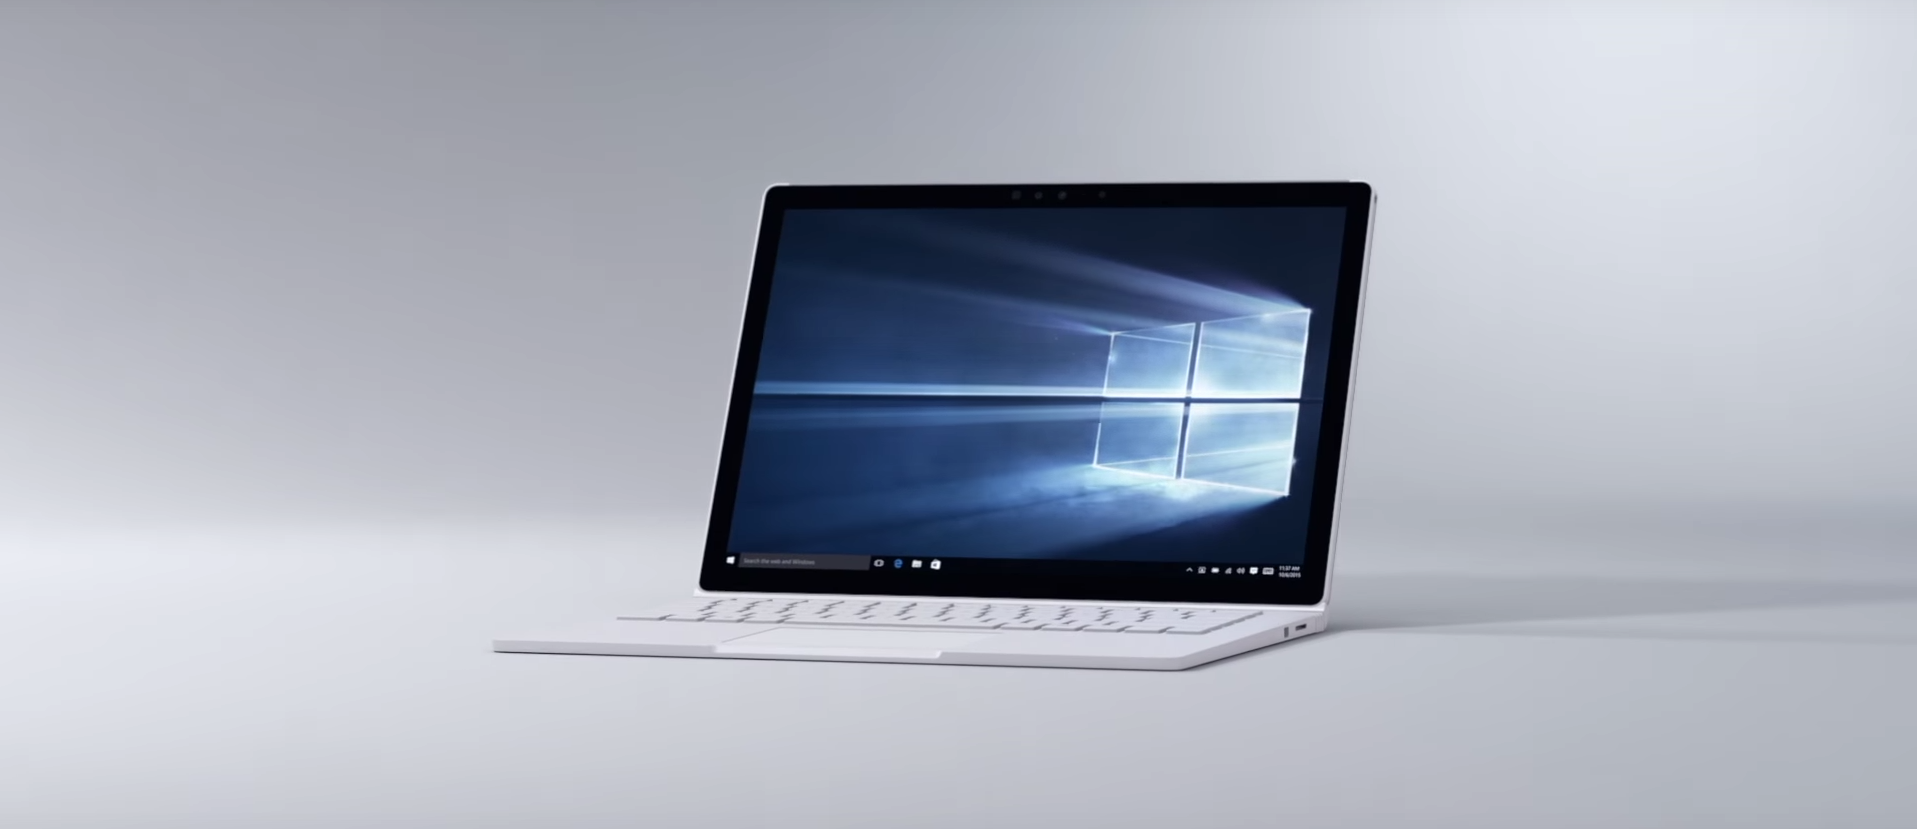 Microsoft Surface Book, un portátil sumamente potente